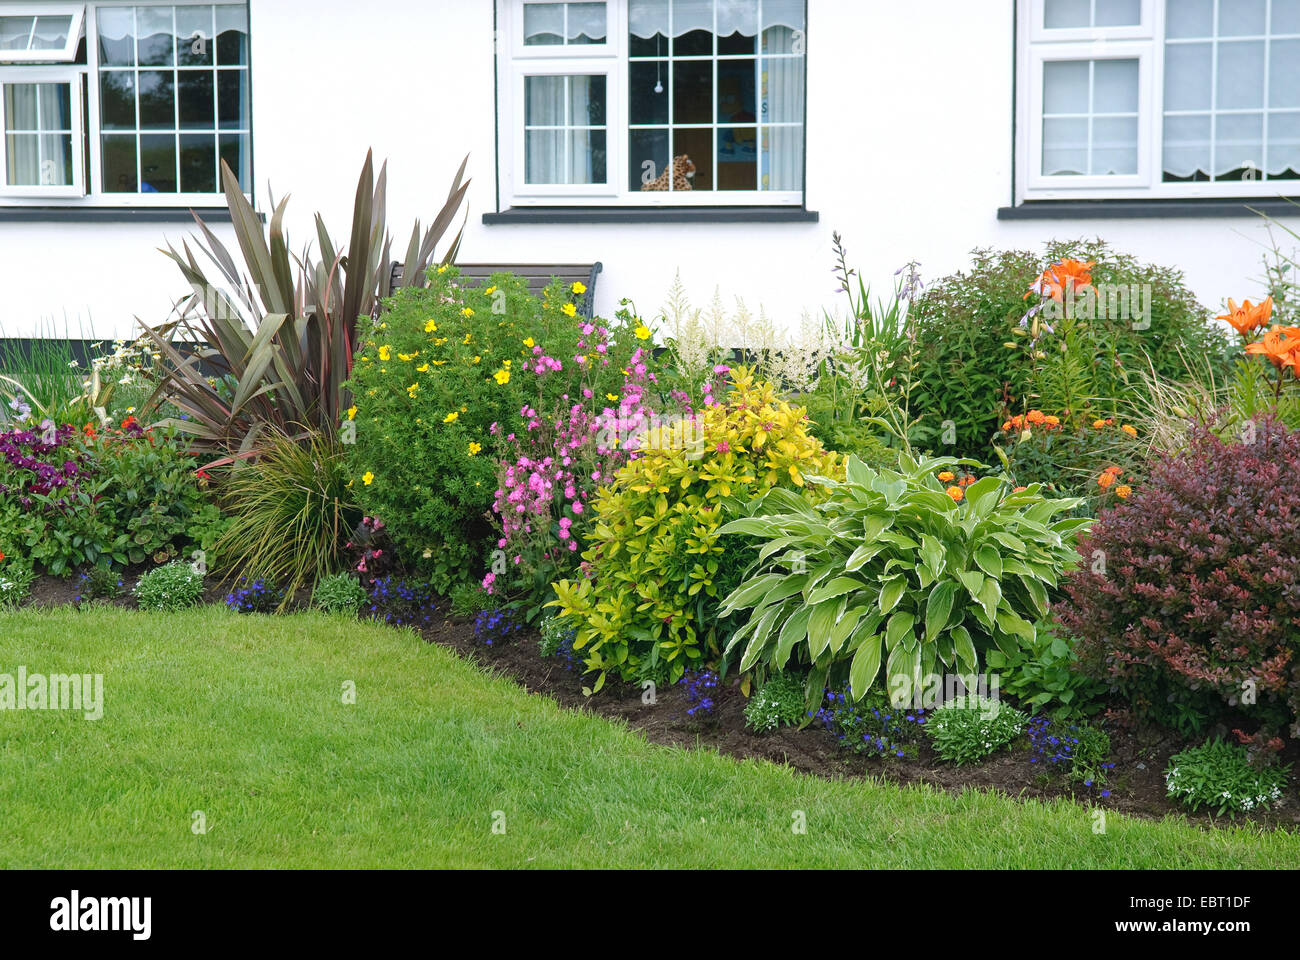 Irish frontgarden florido jardín con plantas, Irlanda, la isla Achill Imagen De Stock